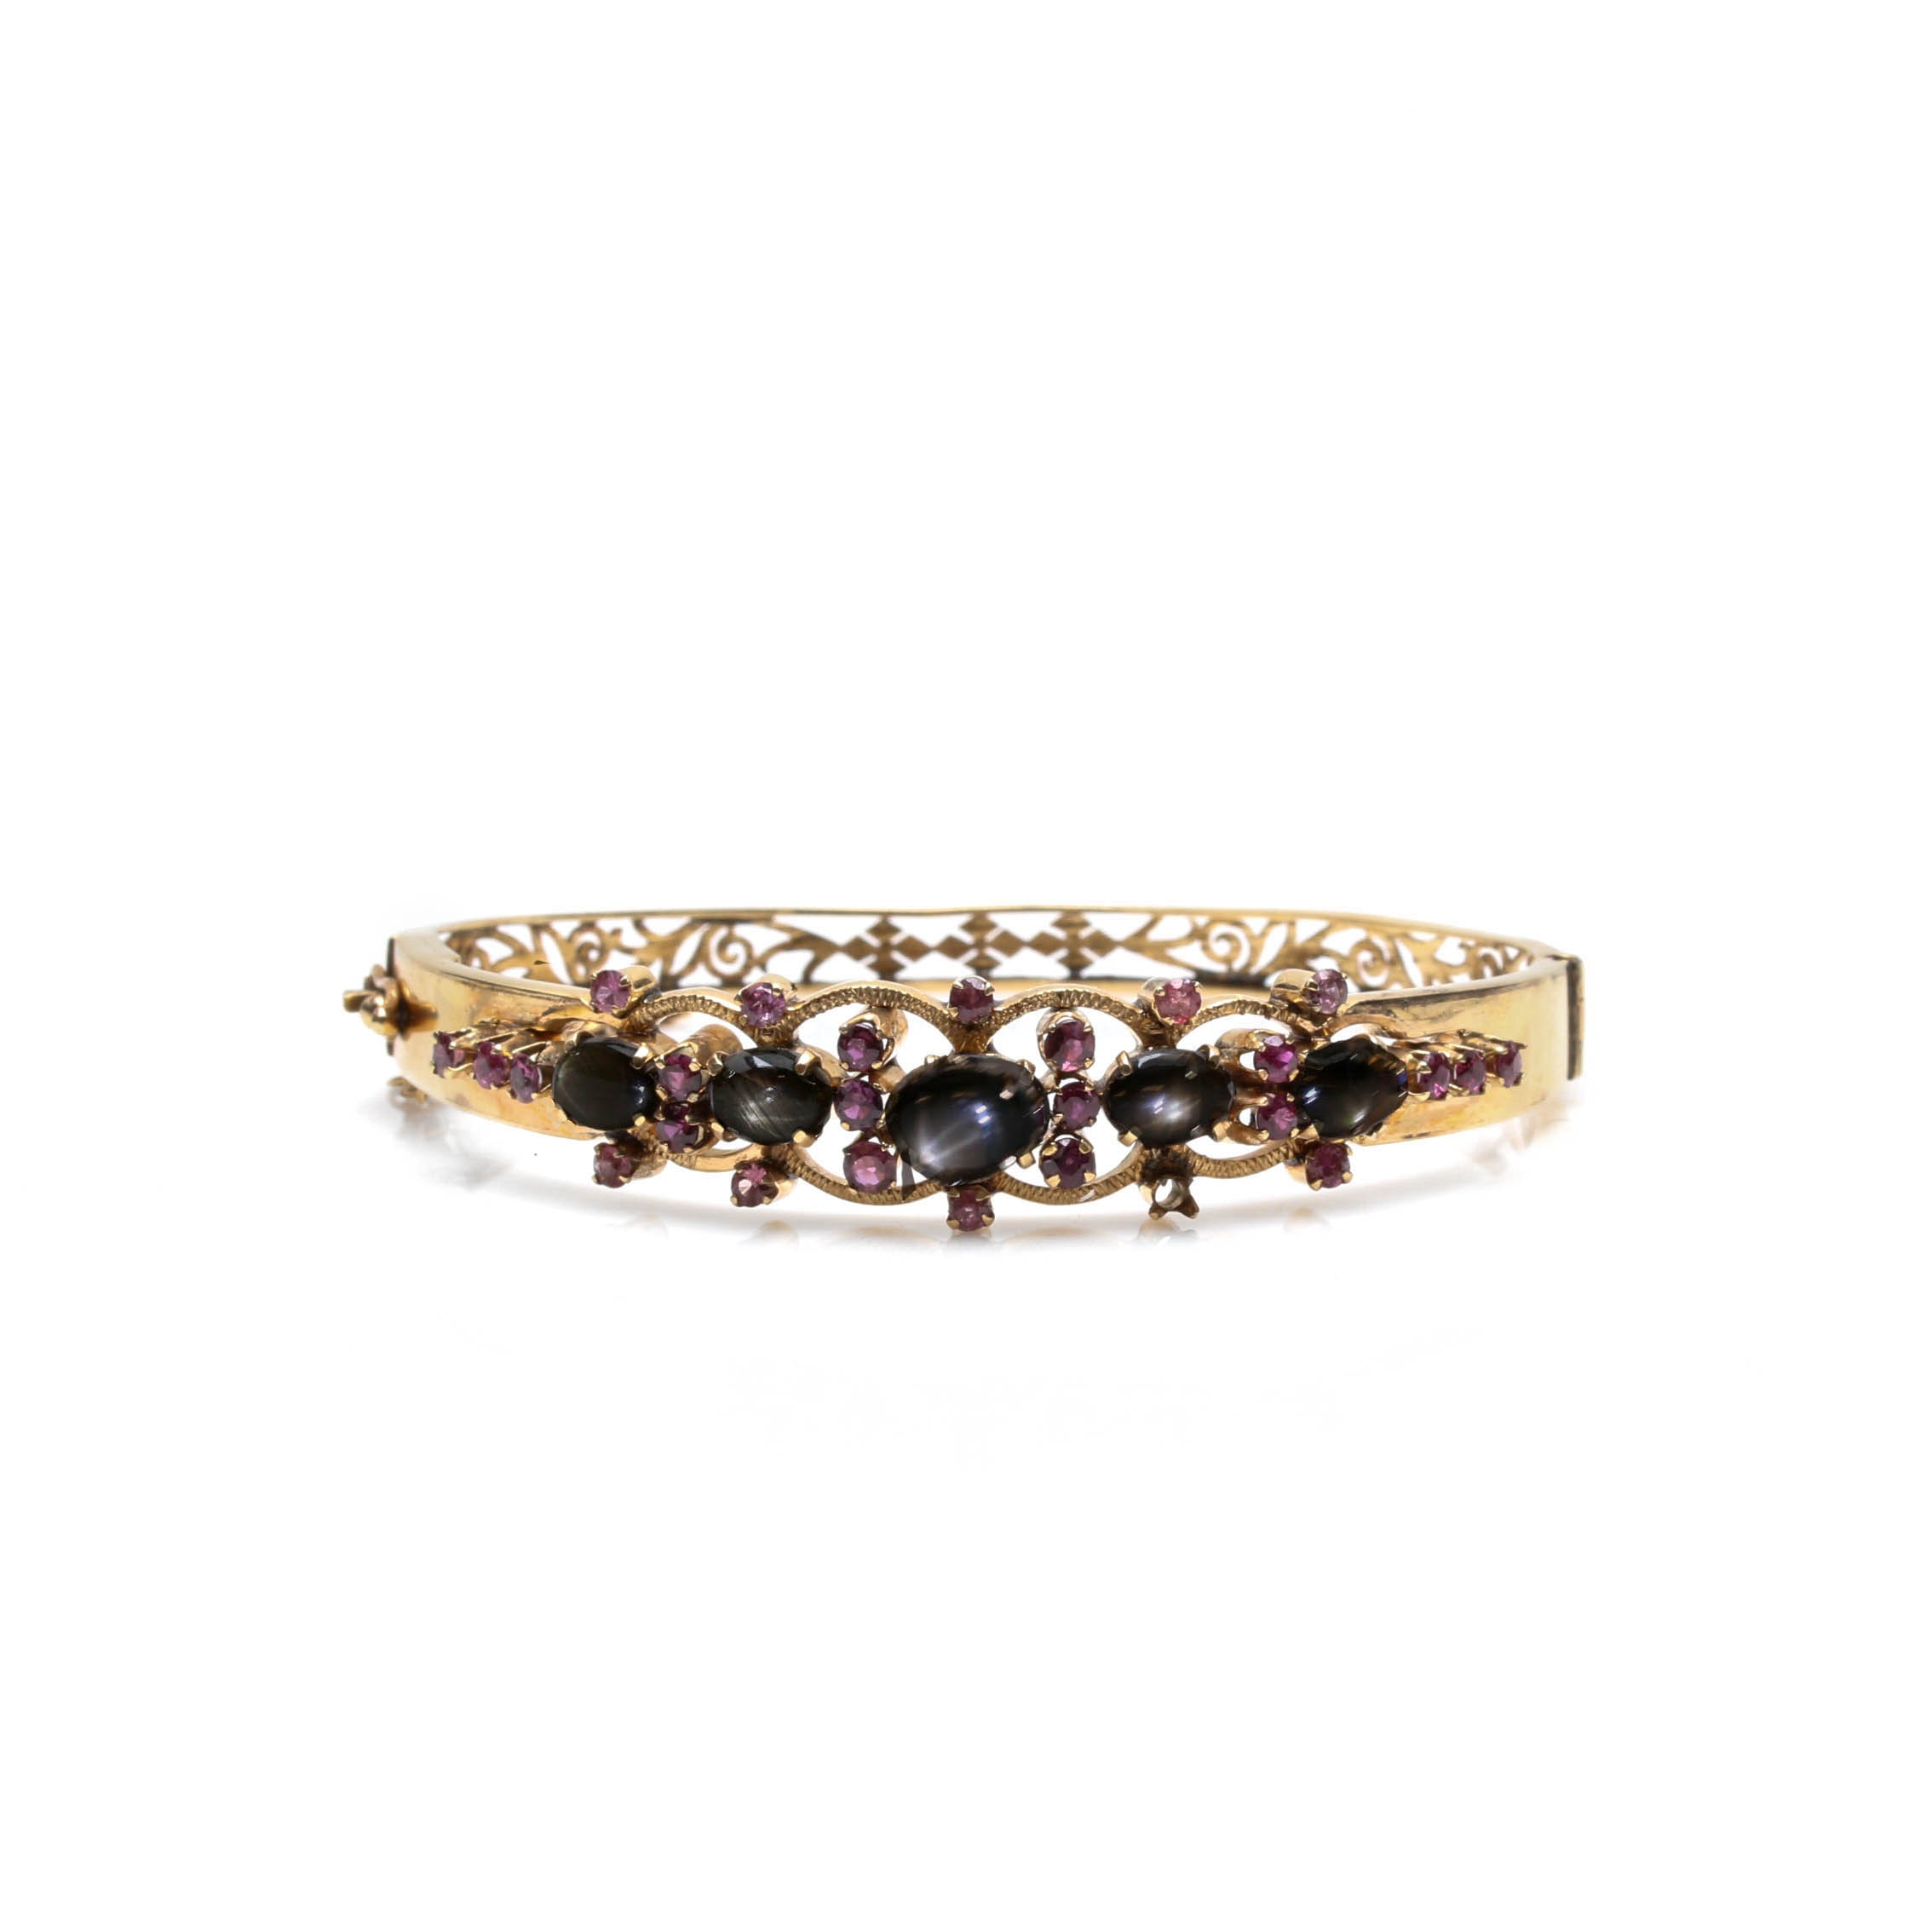 14K Yellow Gold Black Star Sapphire and Ruby Bangle Bracelet